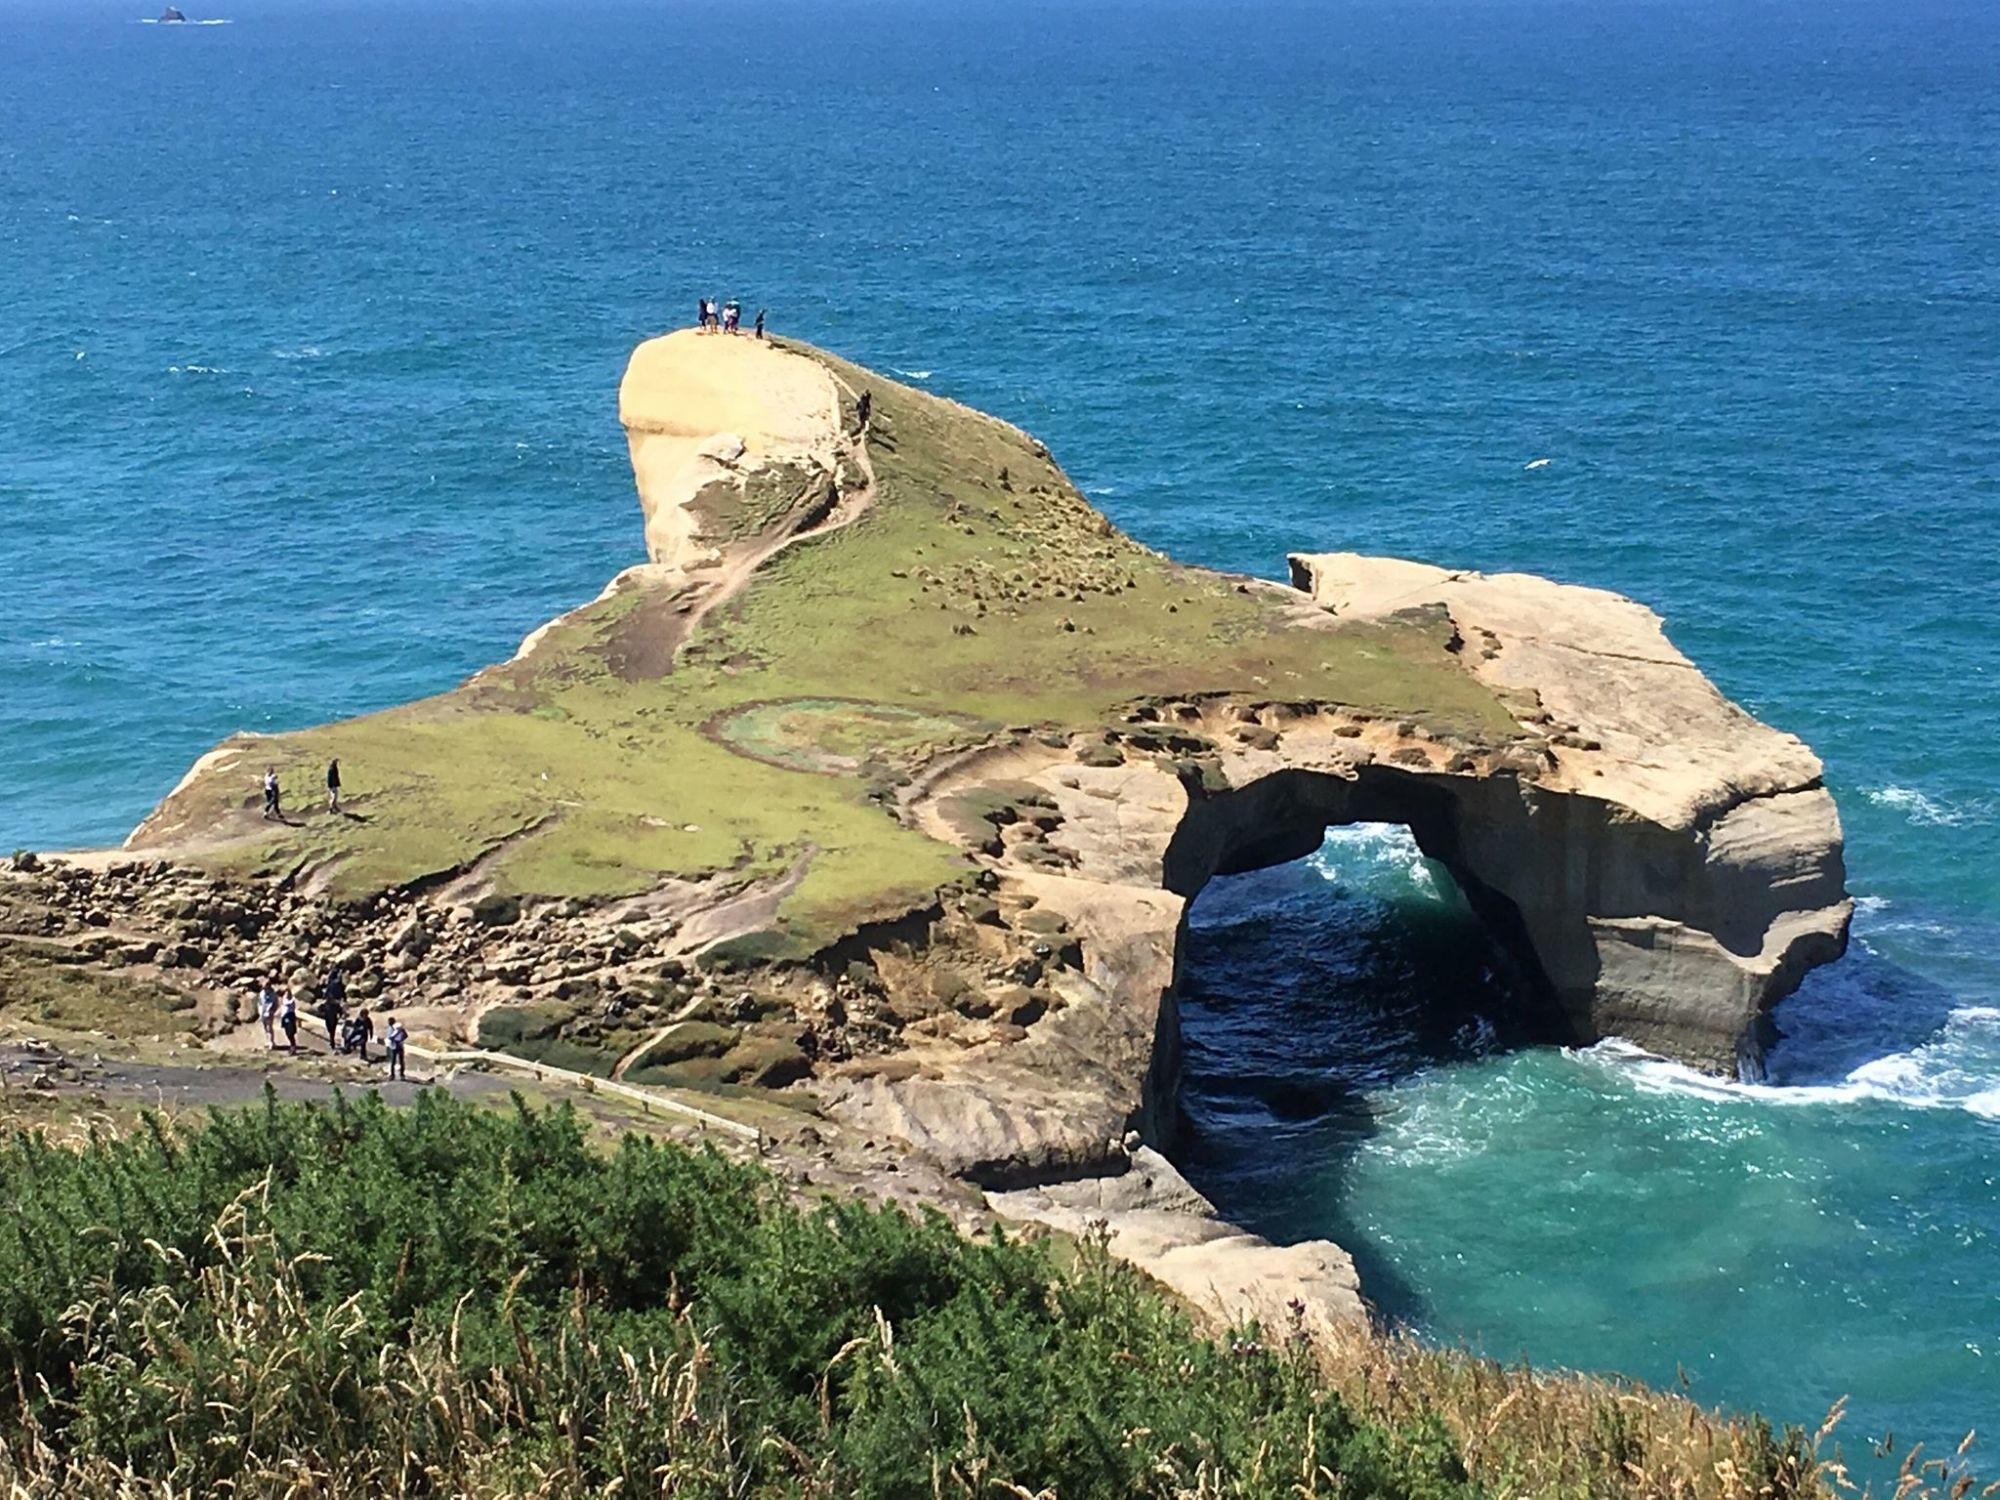 Nový Zéland: Tunnel Beach nedaleko Dunedinu